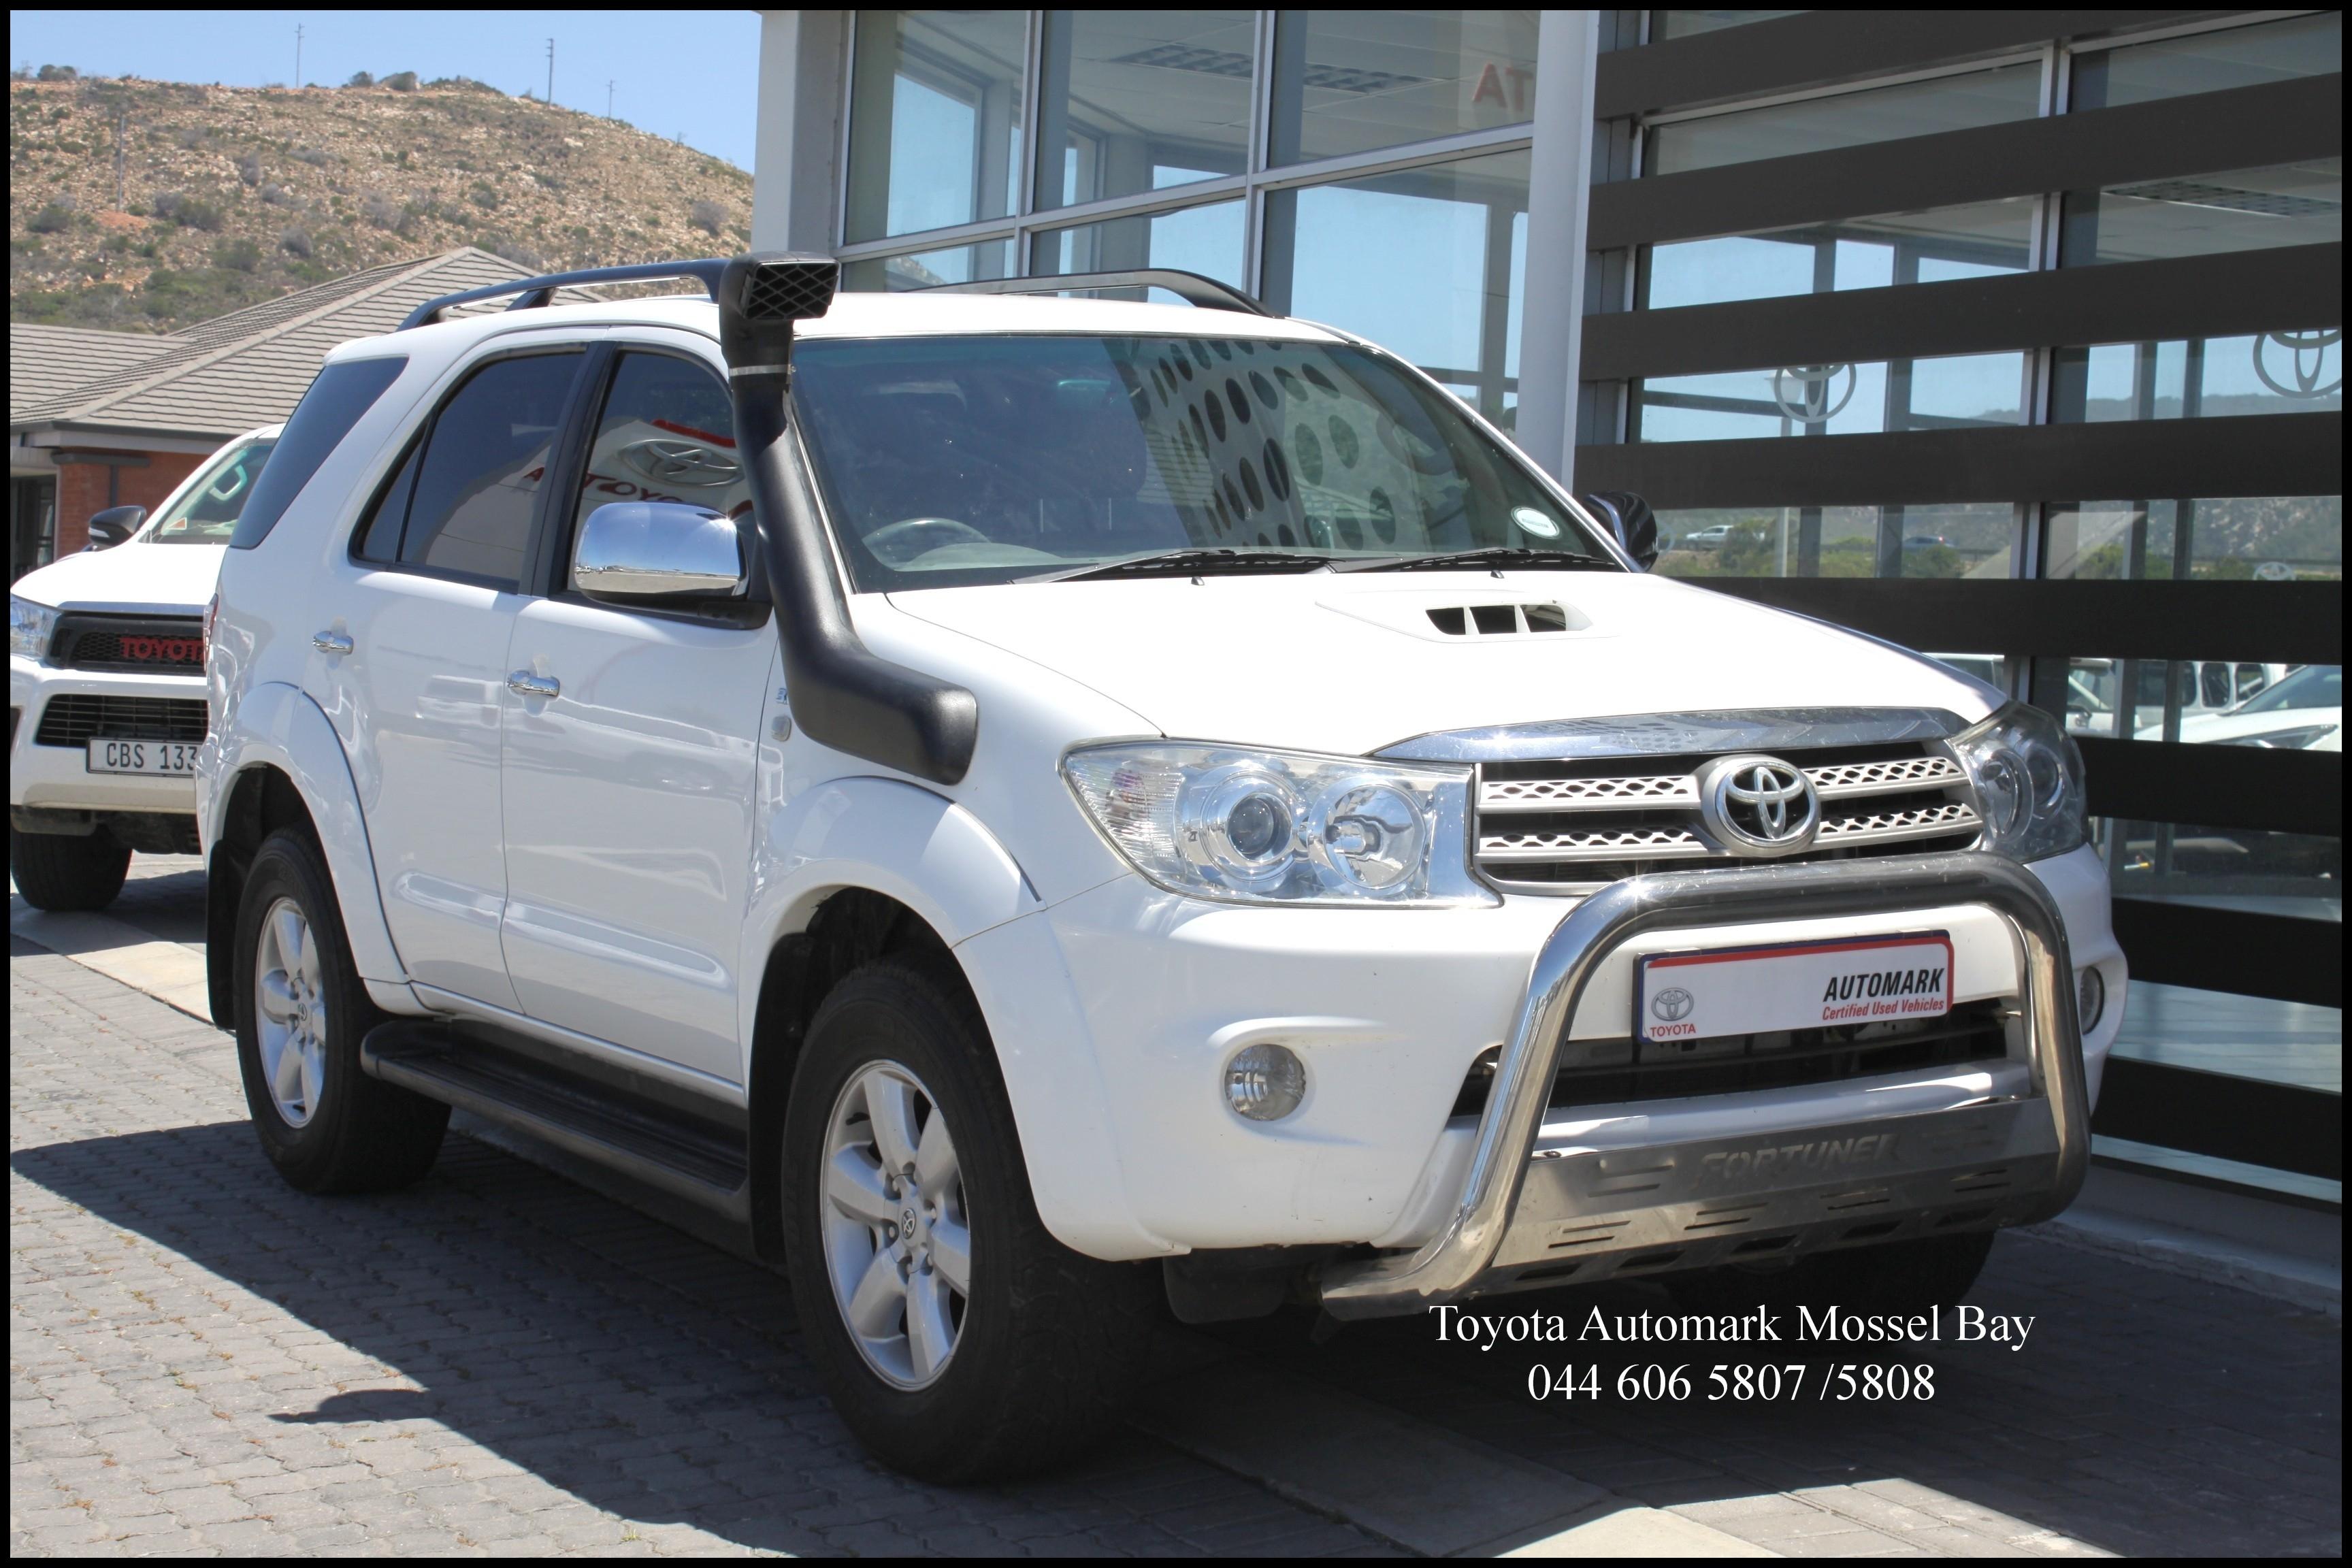 Toyota Rav4 2009 New 2011 toyota fortuner 3 0d 4d 4—4 Auto Mossel Bay